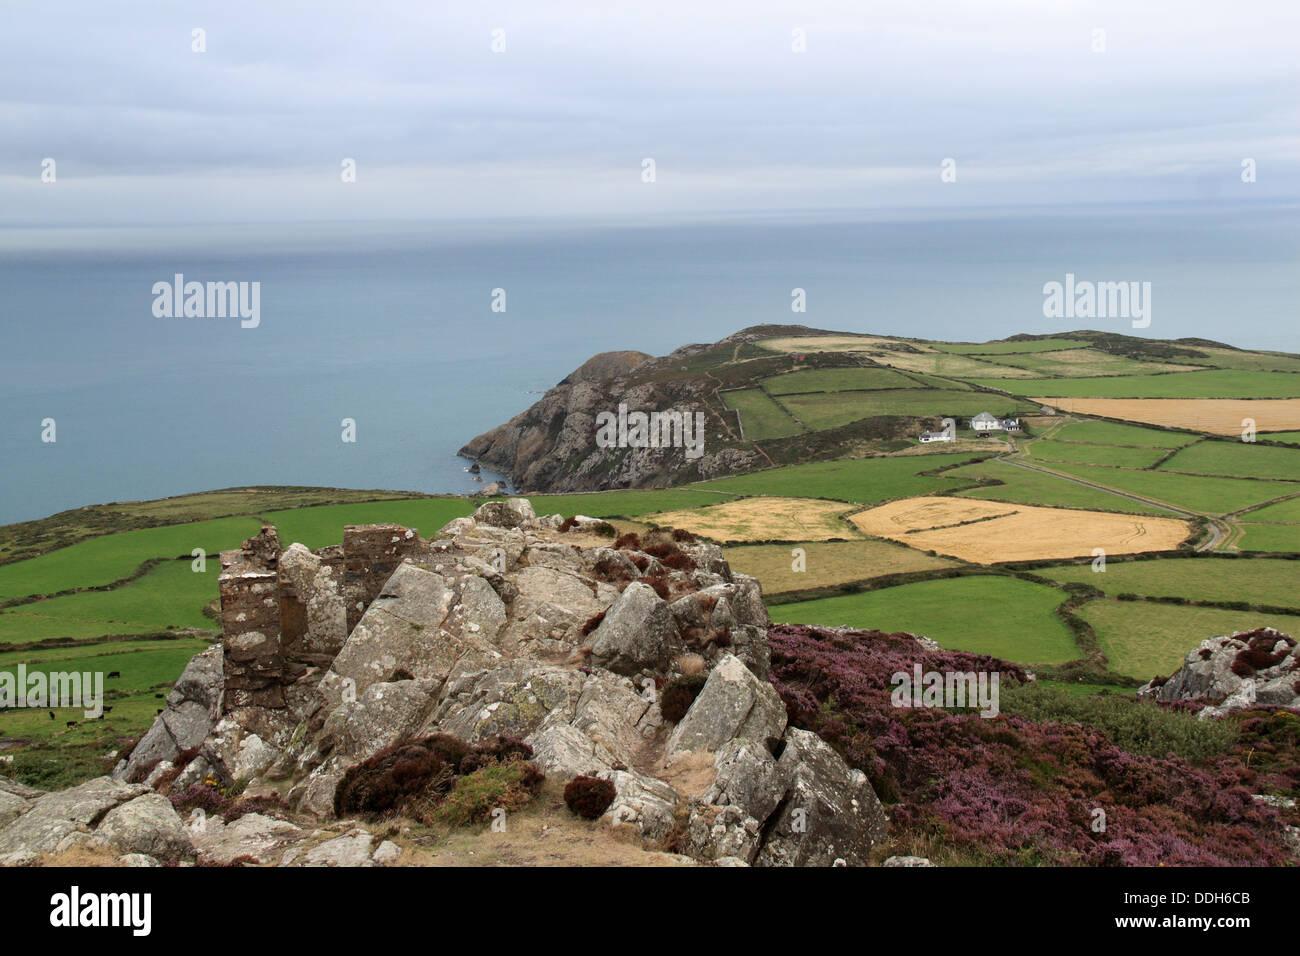 Pen Caer peninsula from Garn Fawr Iron Age Hillfort, Pembrokeshire, Wales, Great Britain, United Kingdom, UK, Europe - Stock Image